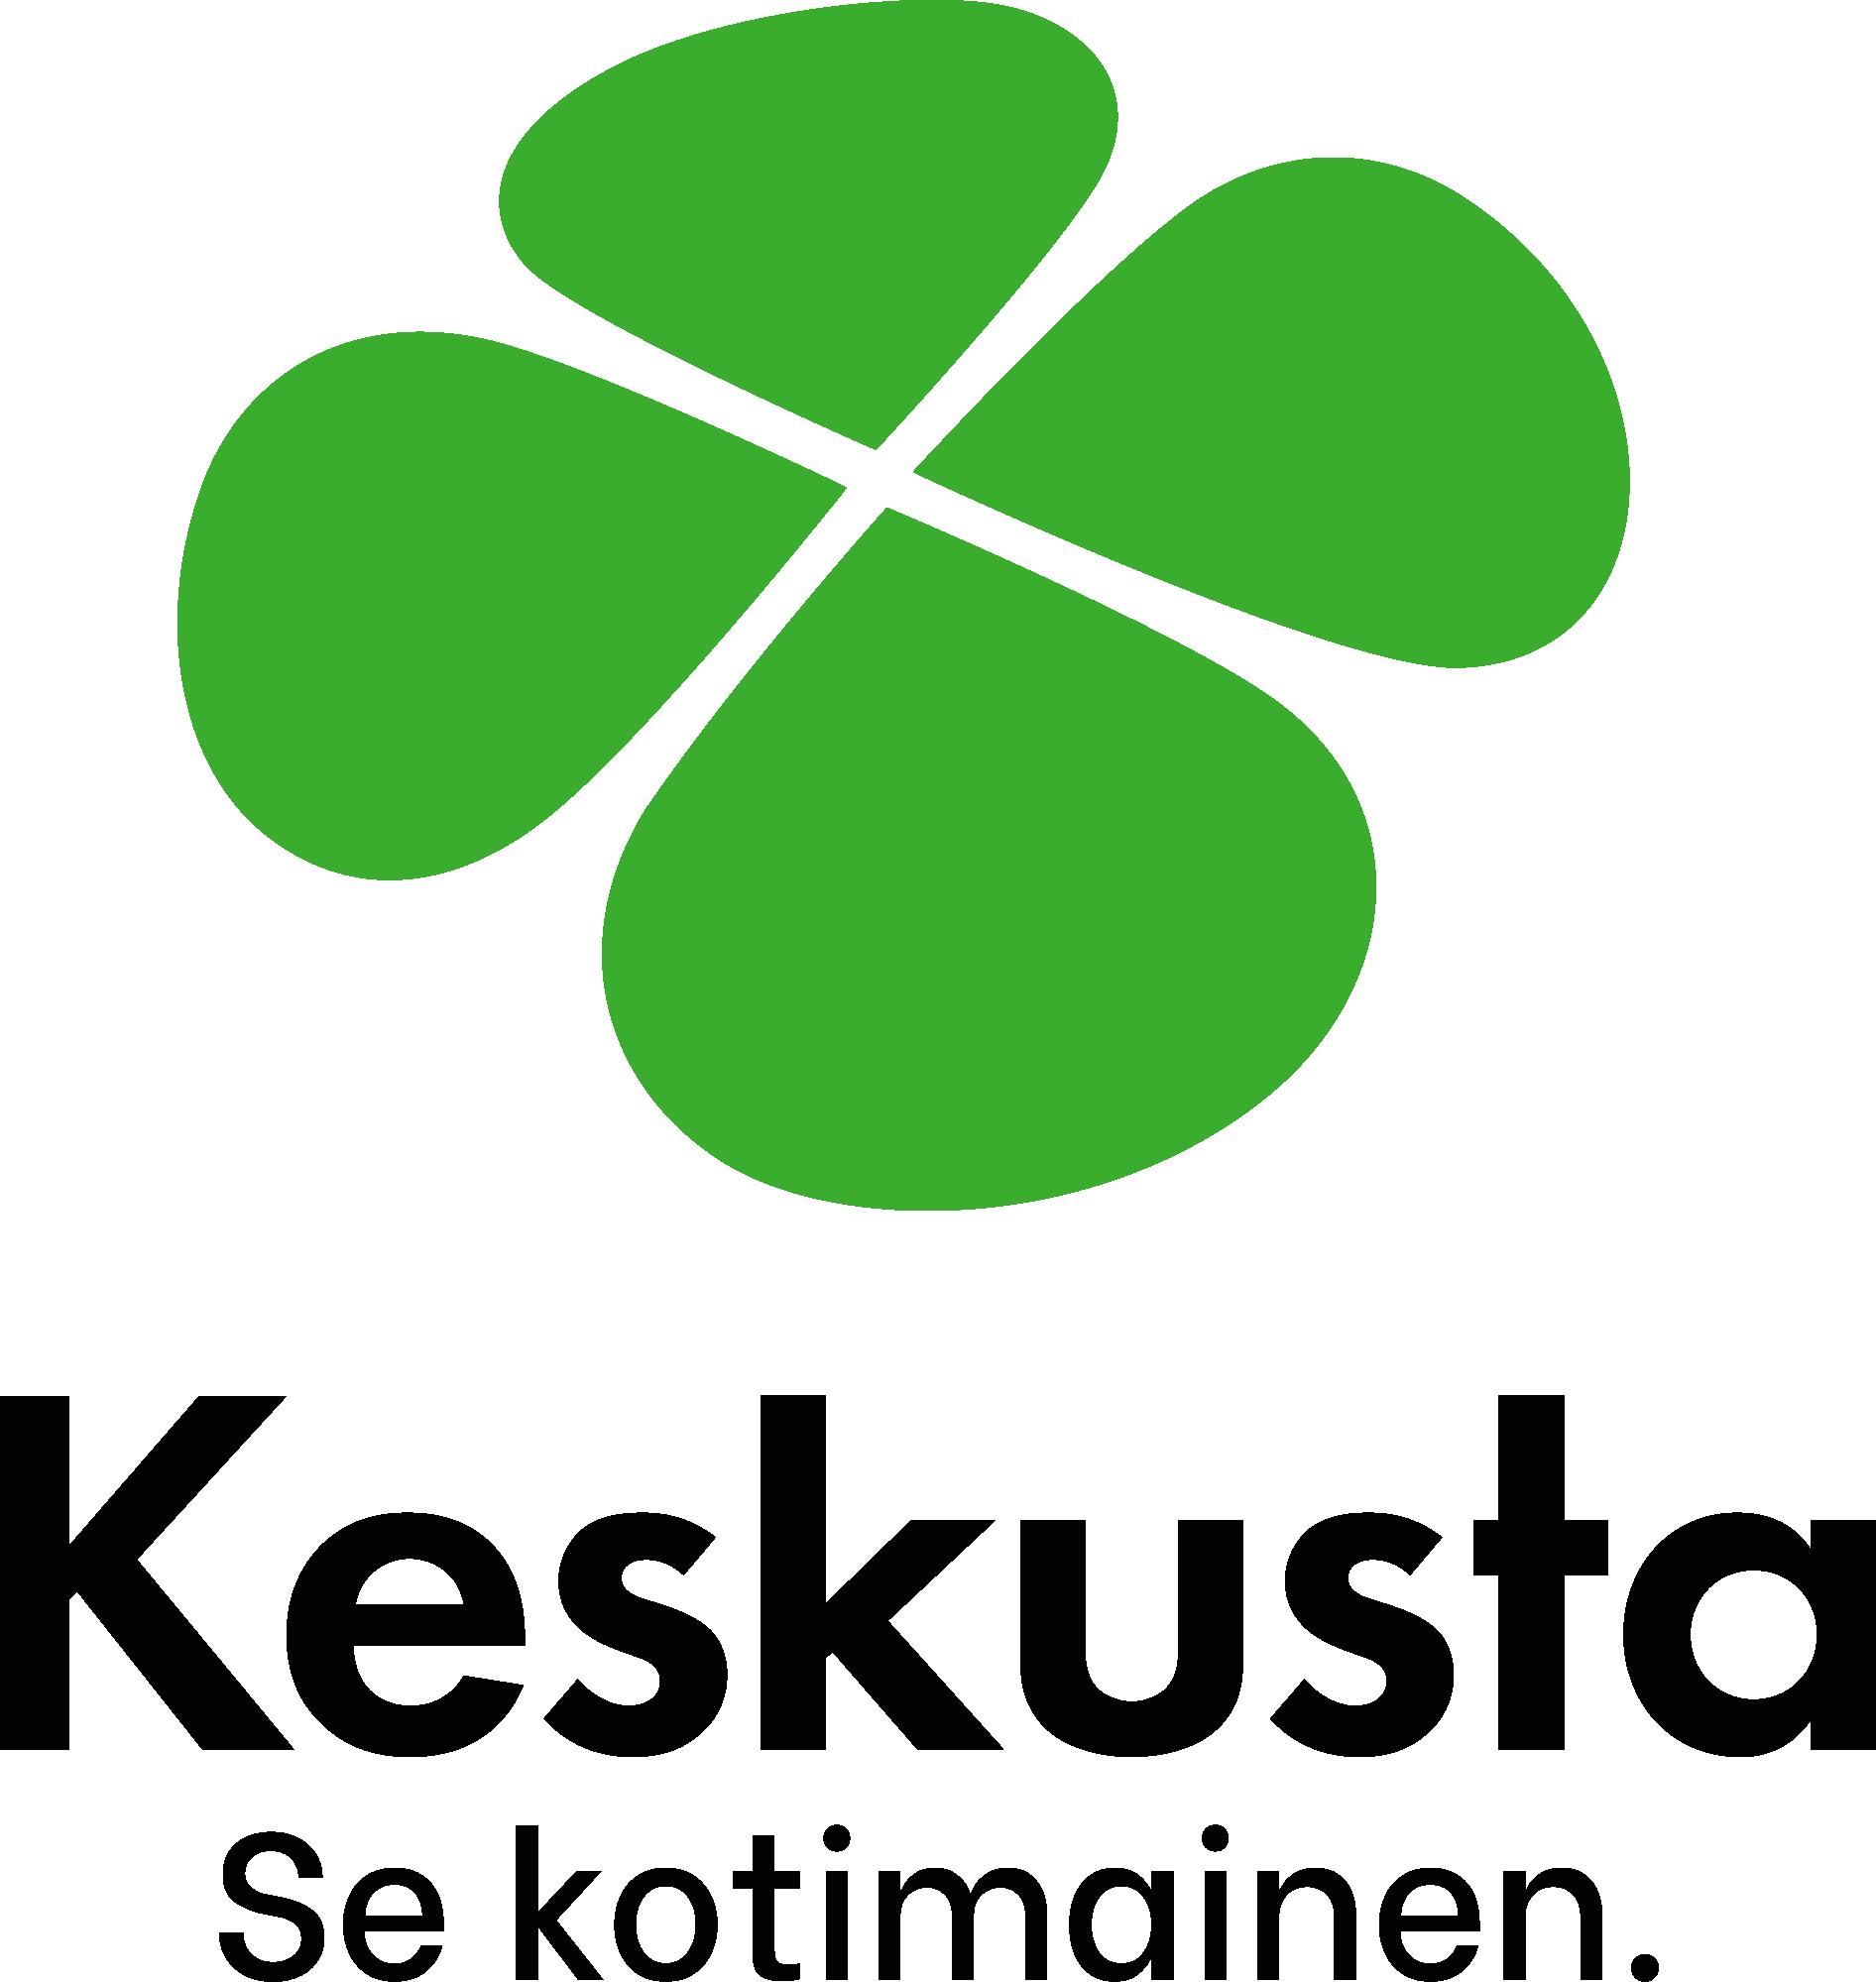 Suomen Keskusta r.p.